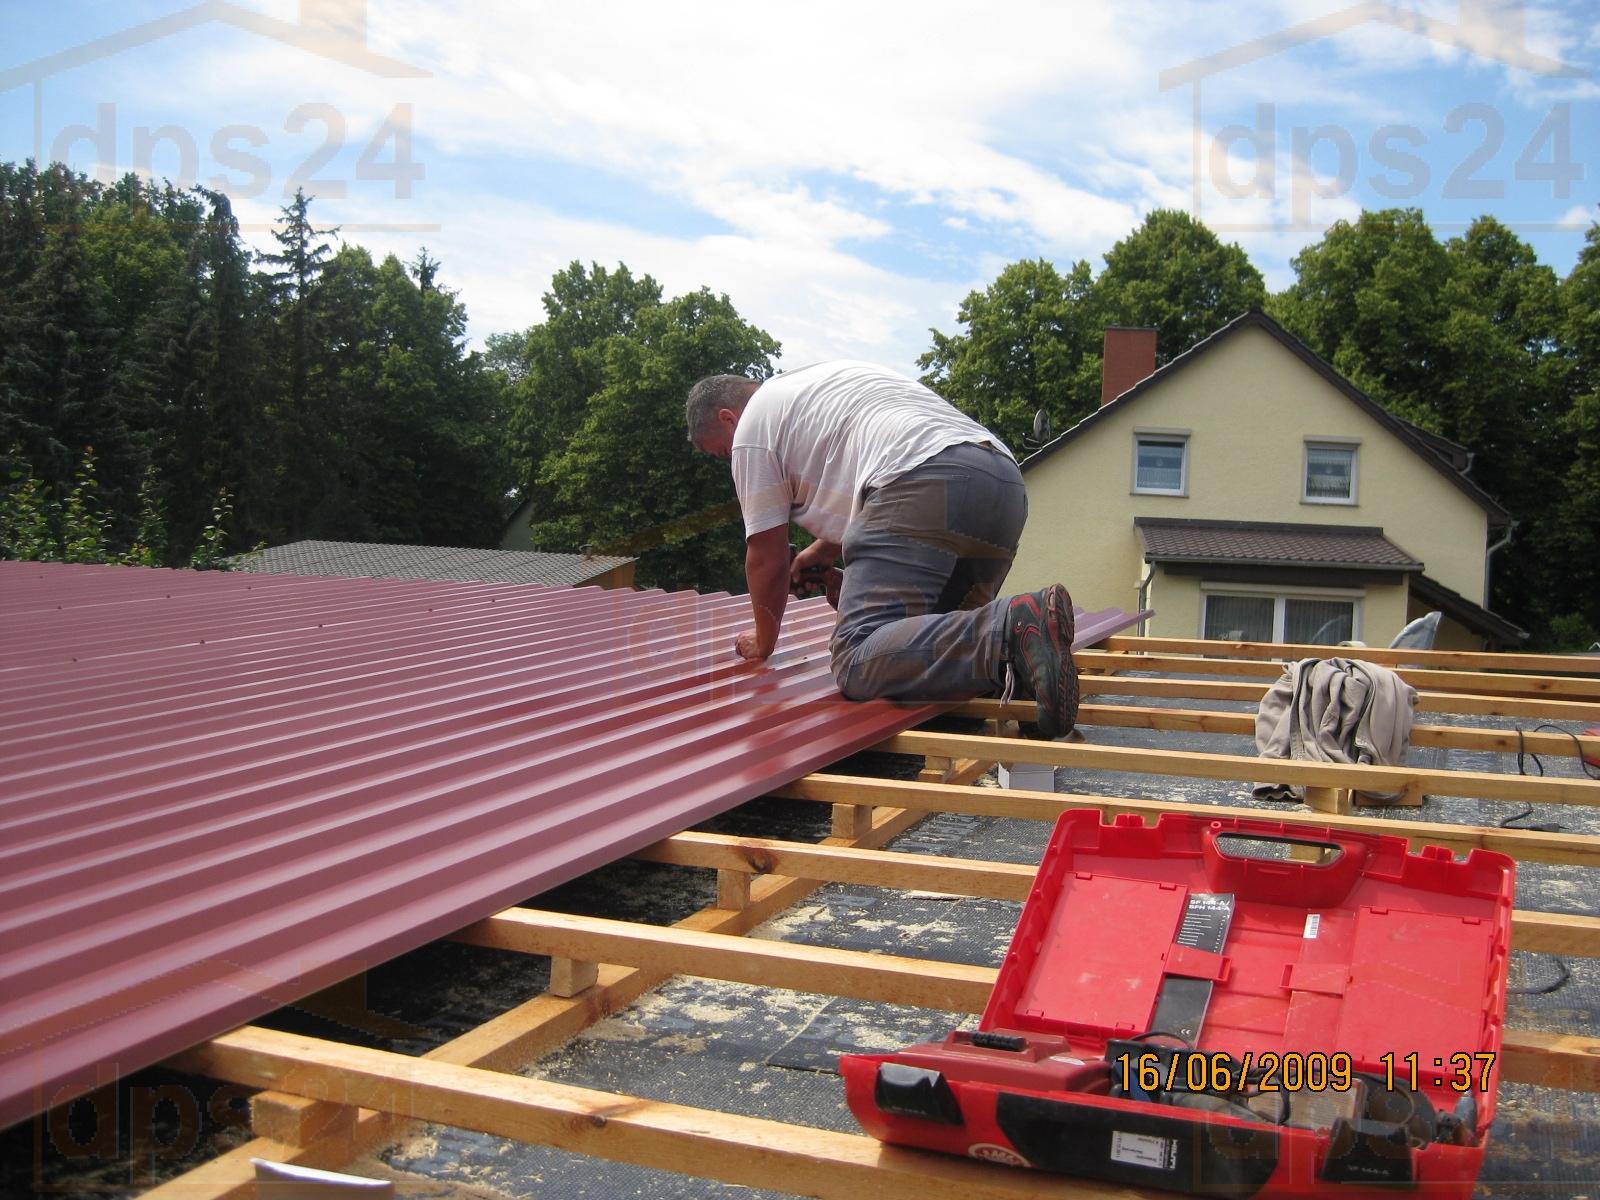 allgemeines zu stahlblech der dachplattenprofi